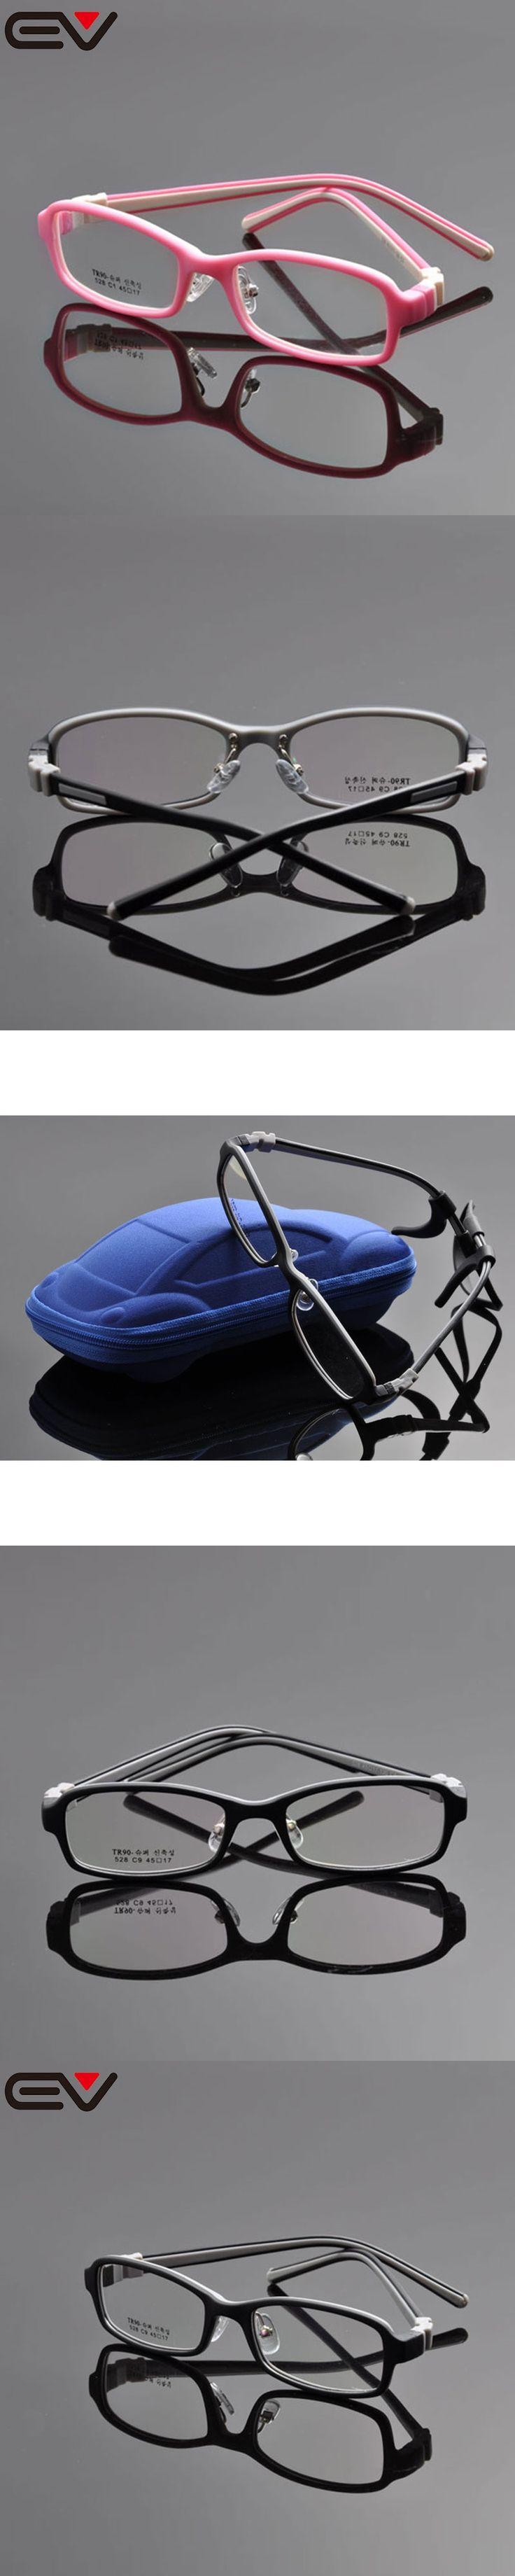 Kids TR90 glasses frame lentes opticos optical glasses clear lens glasses high prescription glasses spectacle frame  EV1073